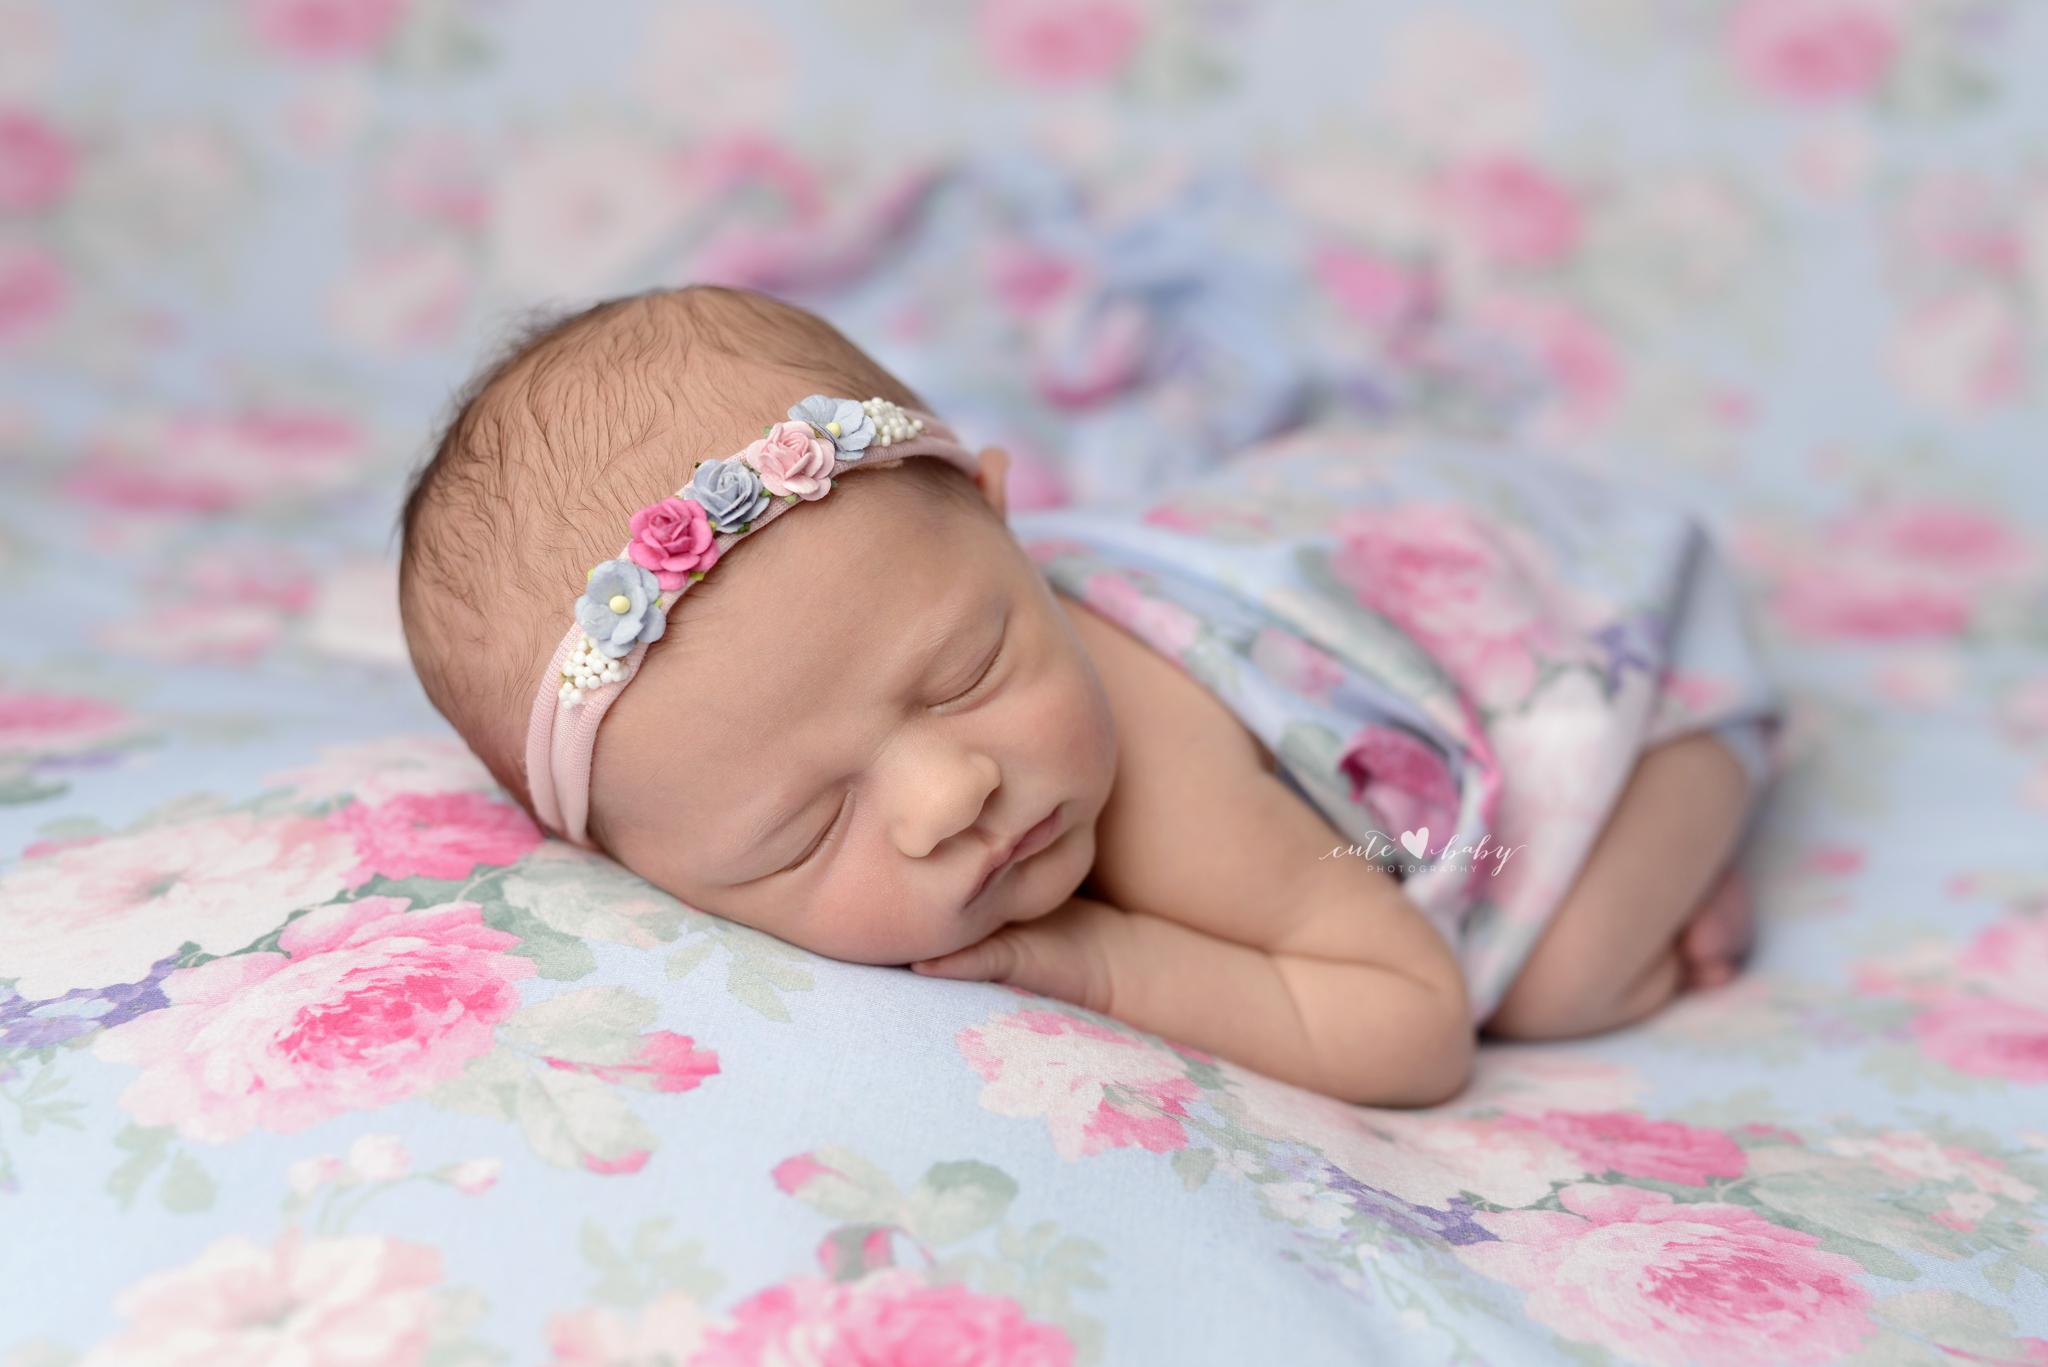 Newborn photography newborn photography manchestercute baby photography